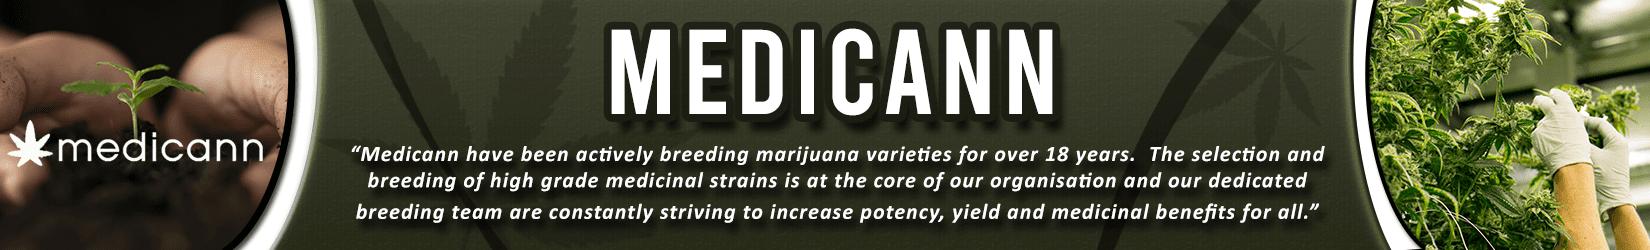 Cannabis Seeds Breeder - Medicann